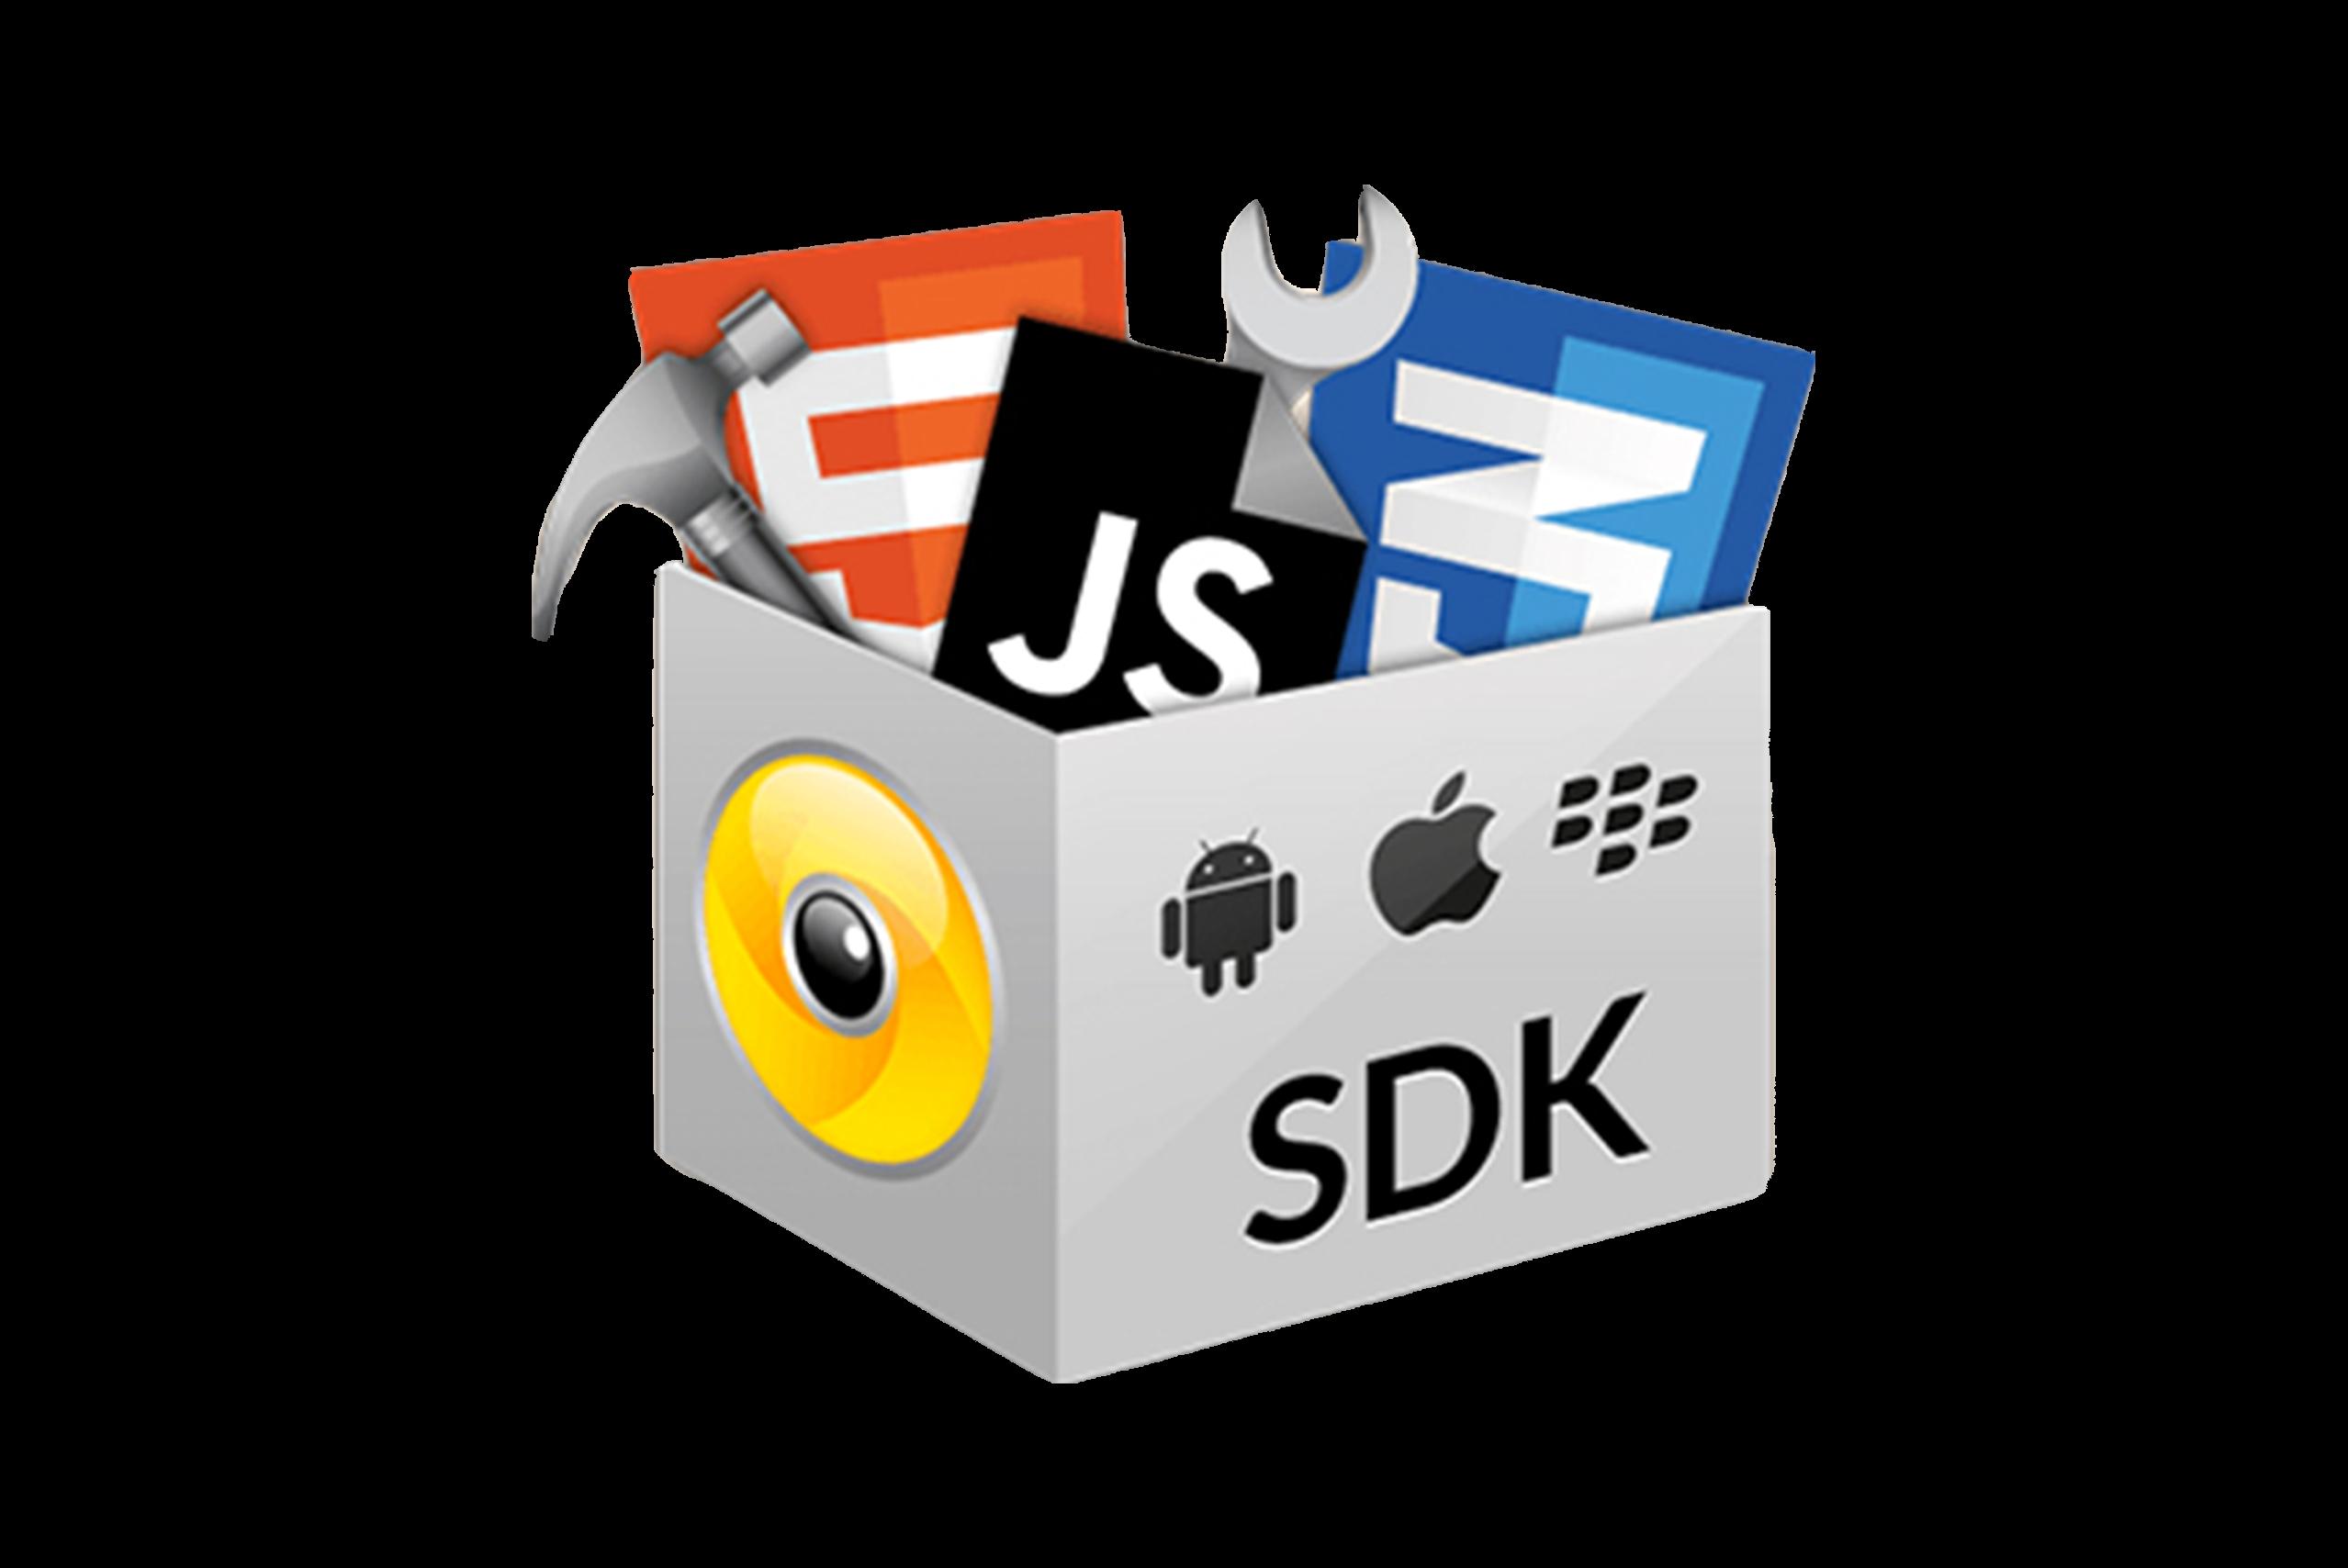 sdk 是 什么